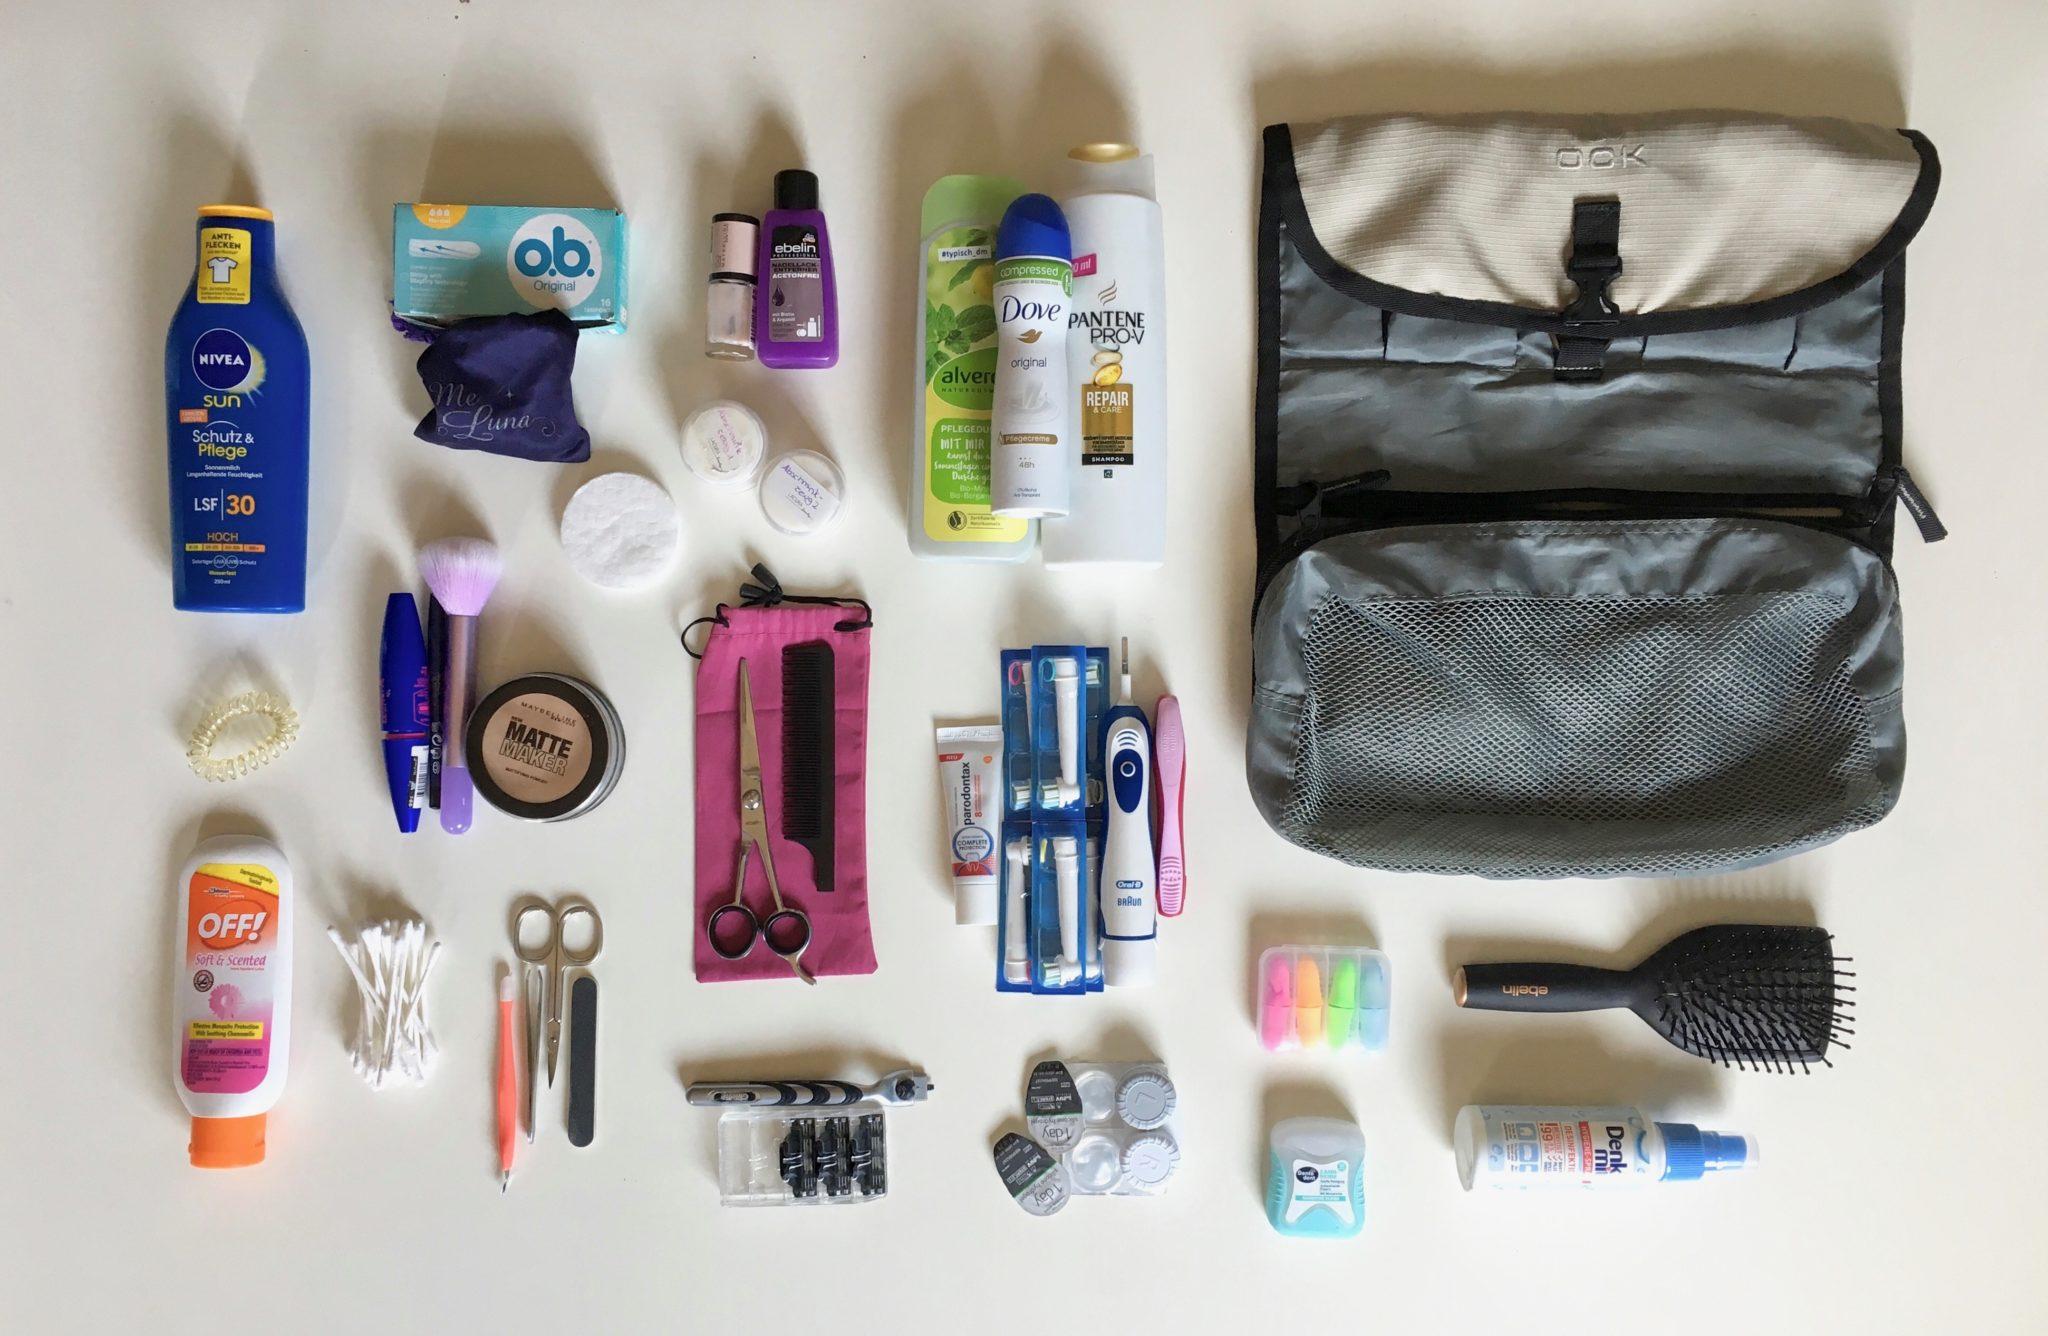 Weltreise Packliste Kosmetika